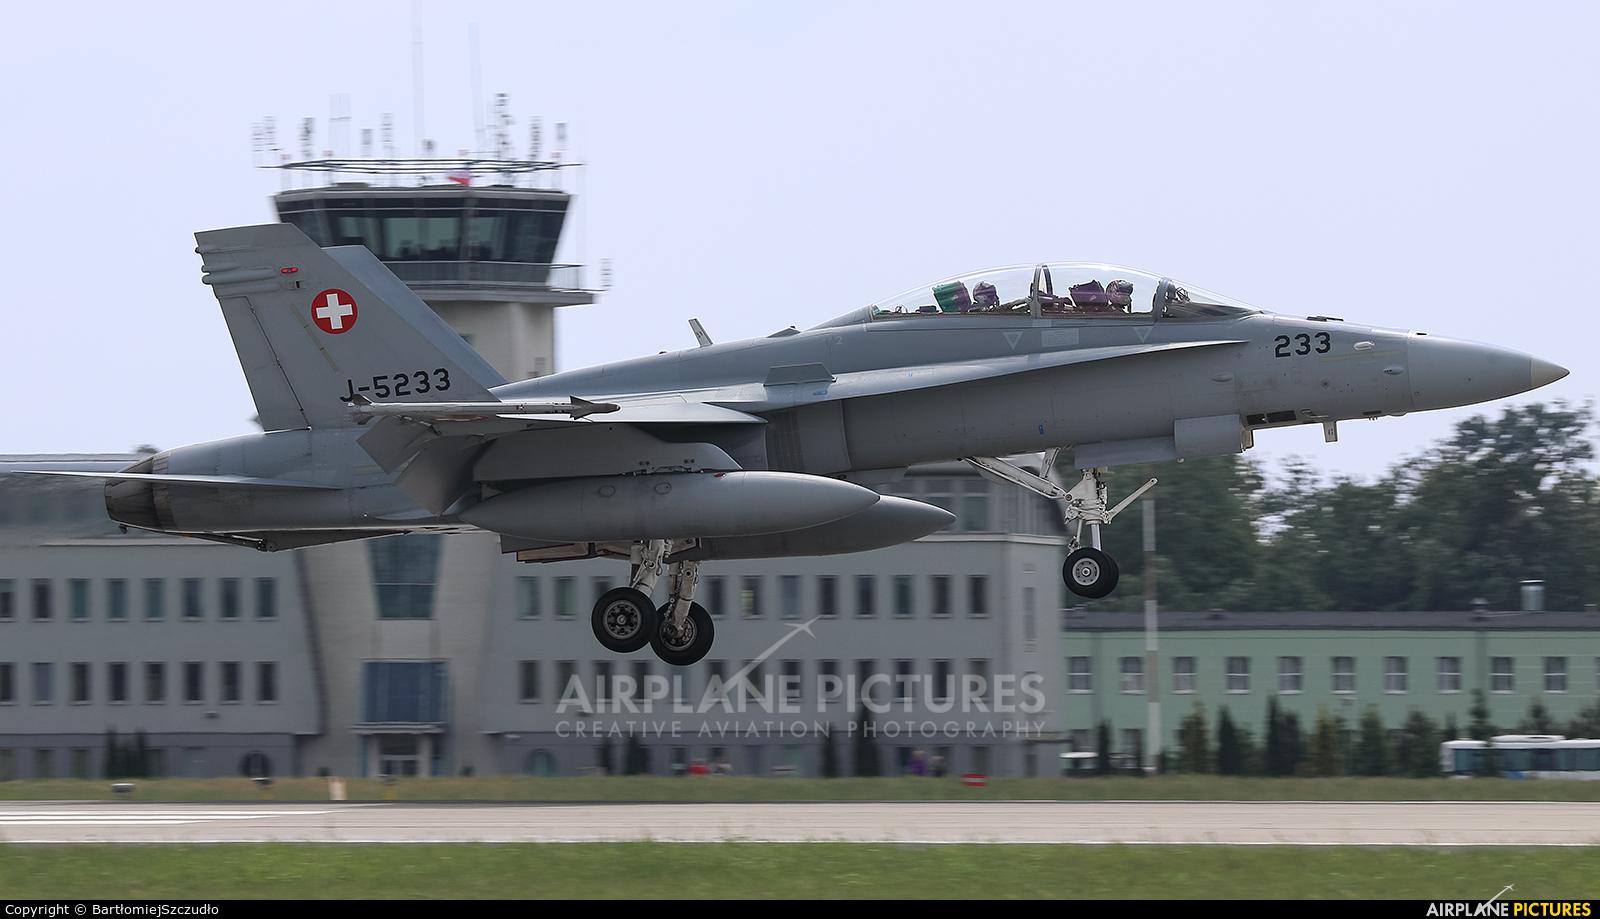 Switzerland - Air Force J-5233 aircraft at Poznań - Krzesiny